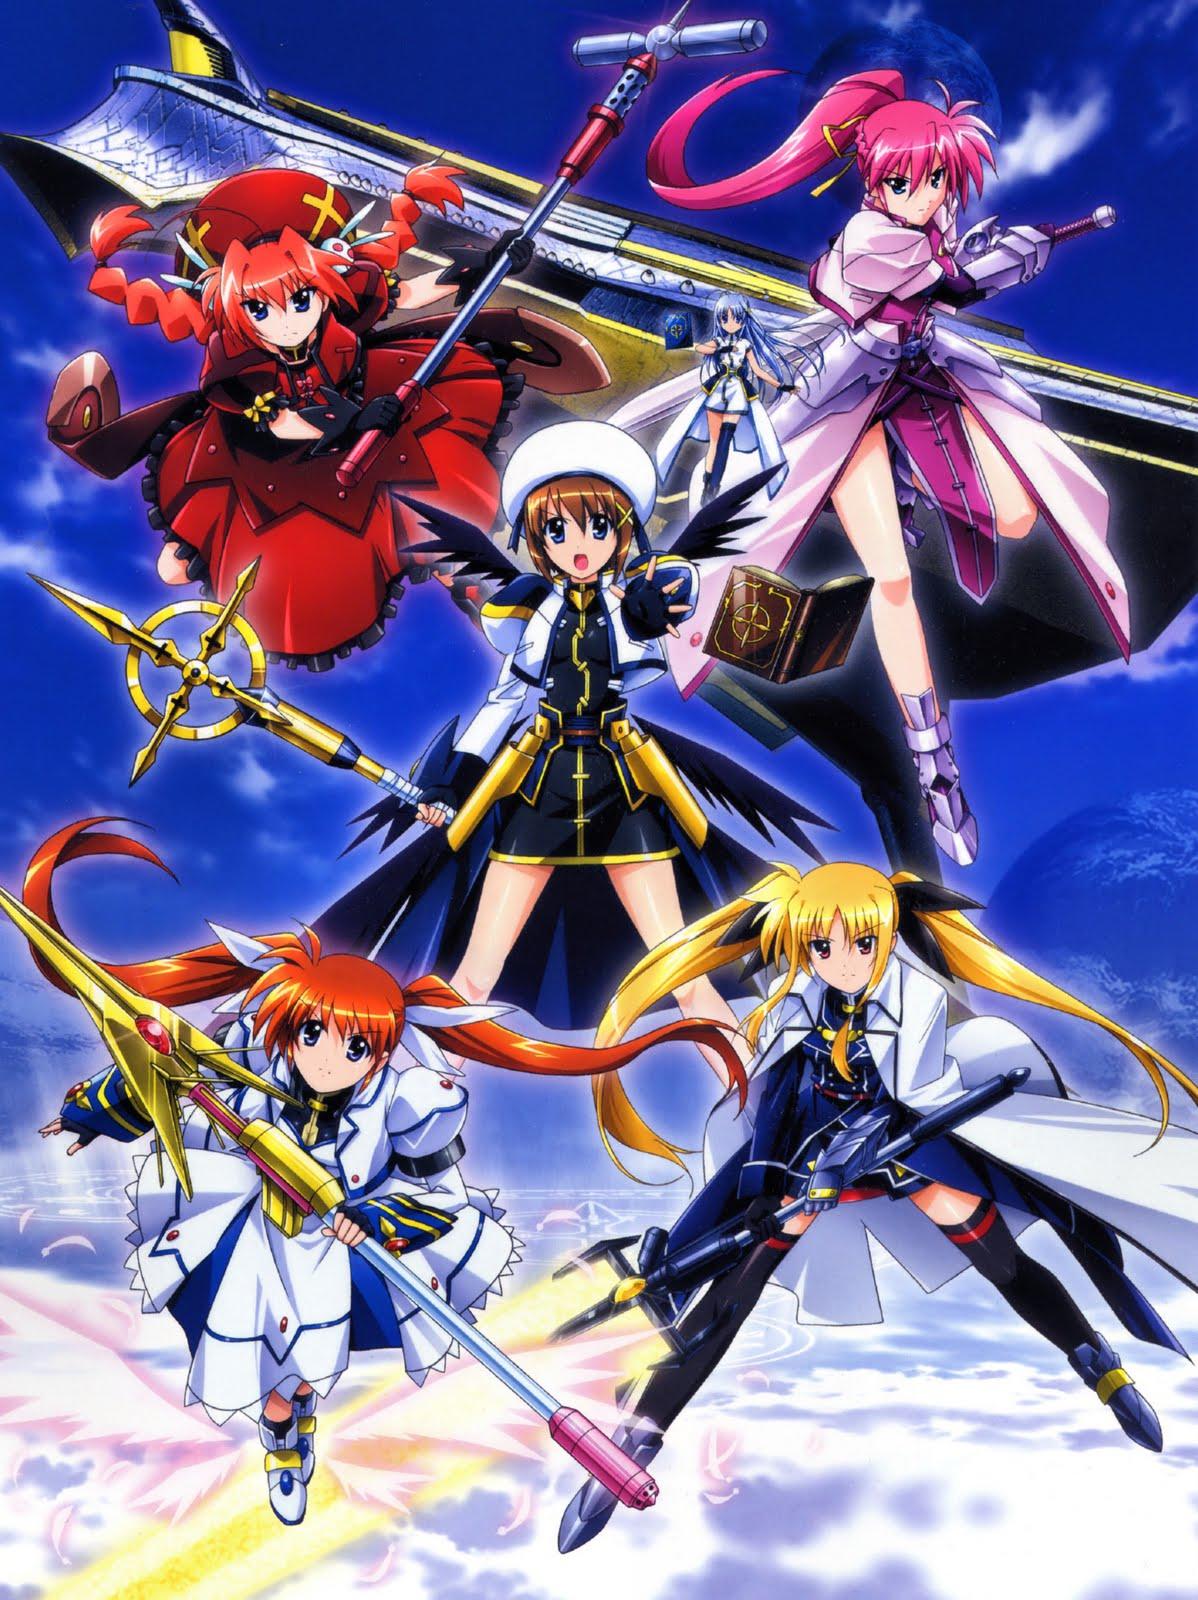 Moe Anime Girl Wallpaper Anim Angel Generos De Anime